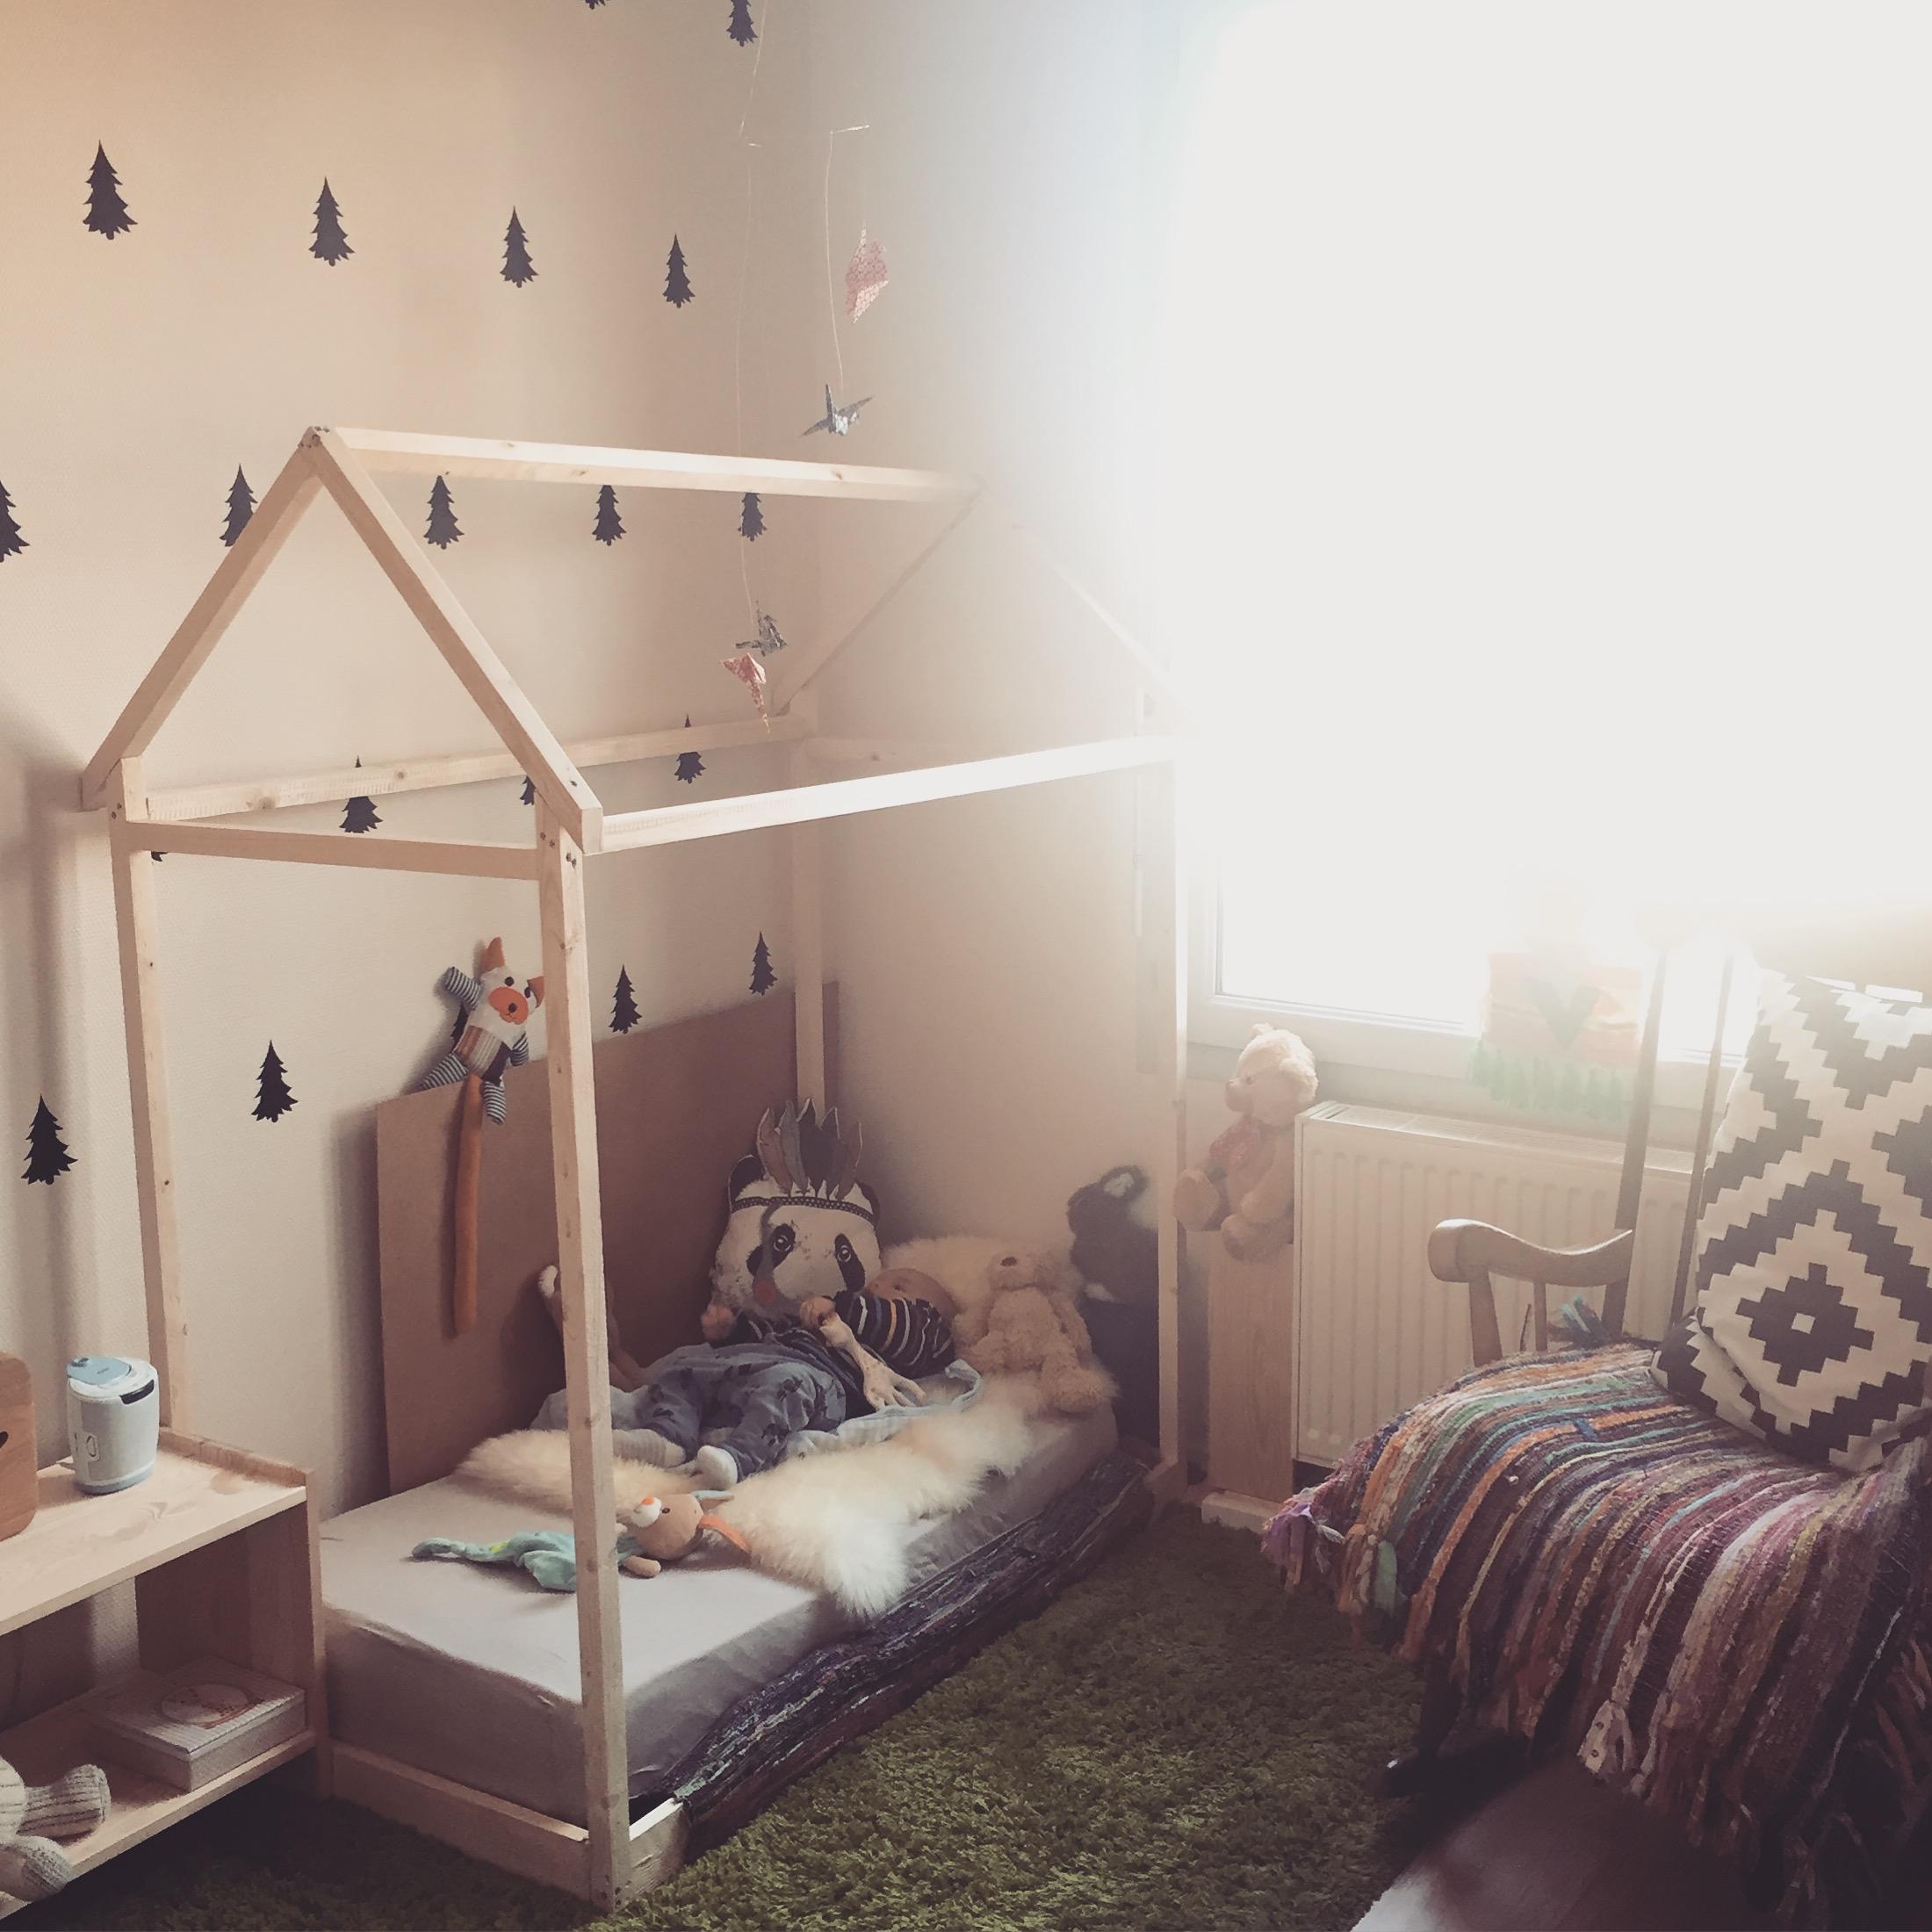 img 2893 hellozadig. Black Bedroom Furniture Sets. Home Design Ideas